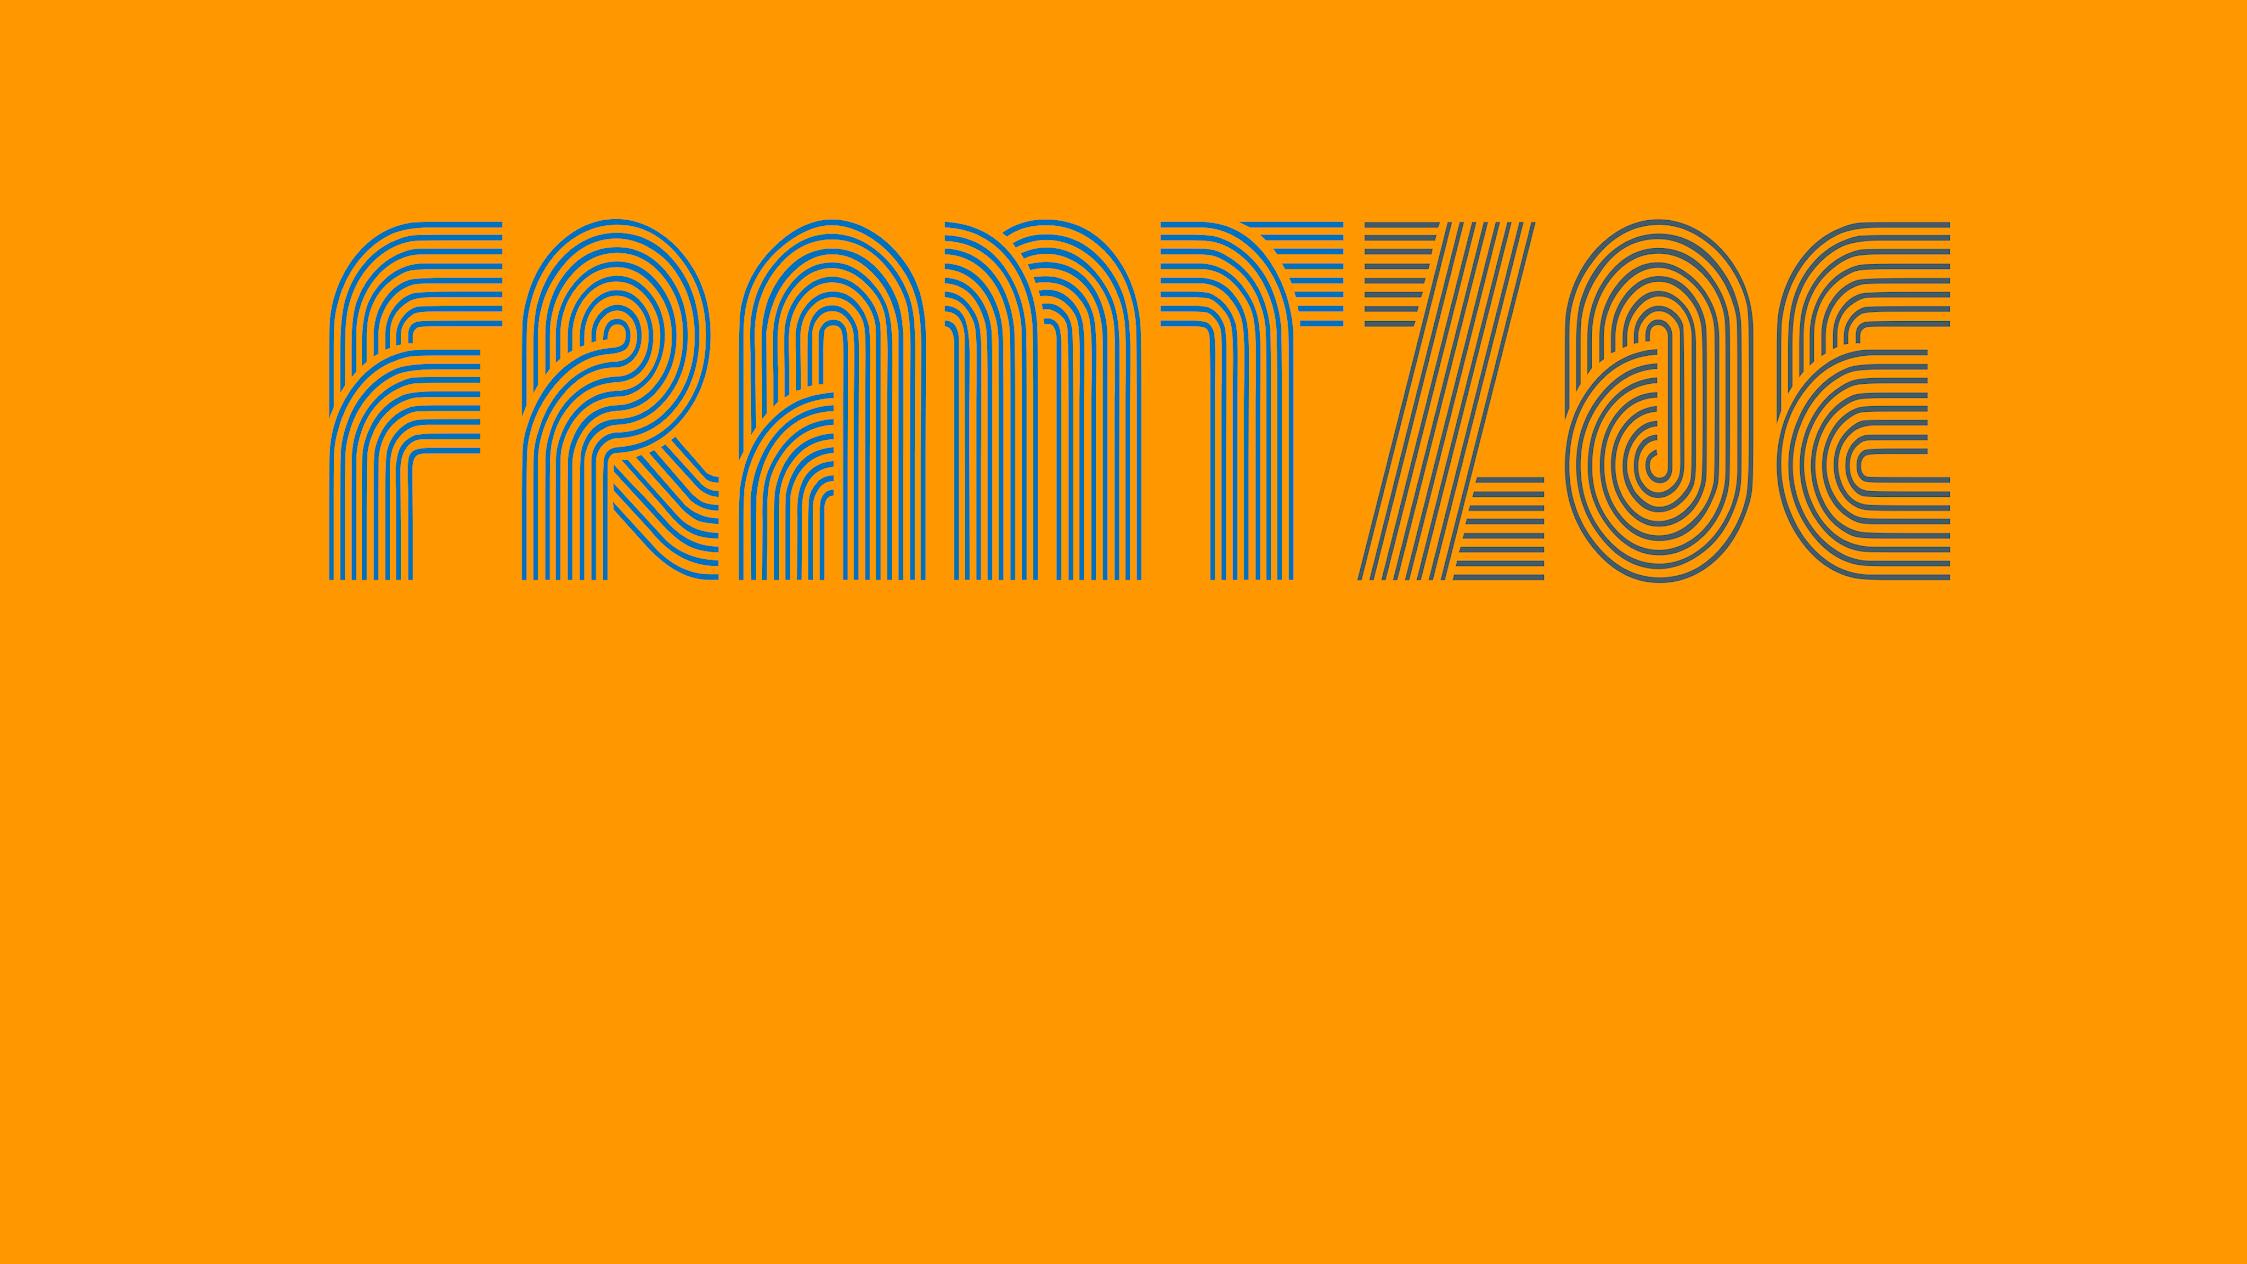 FrantZoe